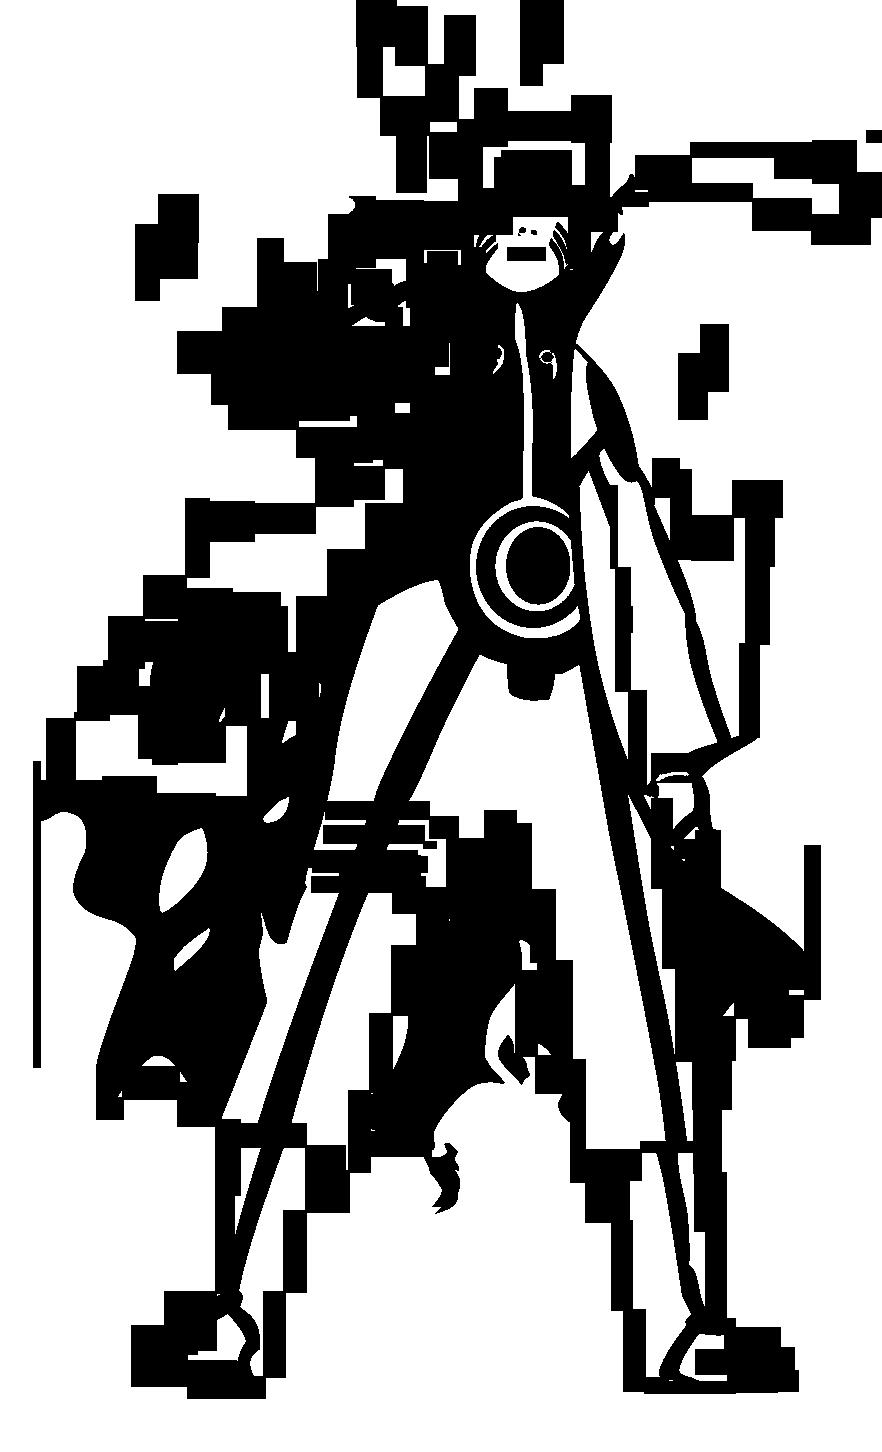 Naruto Lineart : Naruto line art by mardon on deviantart